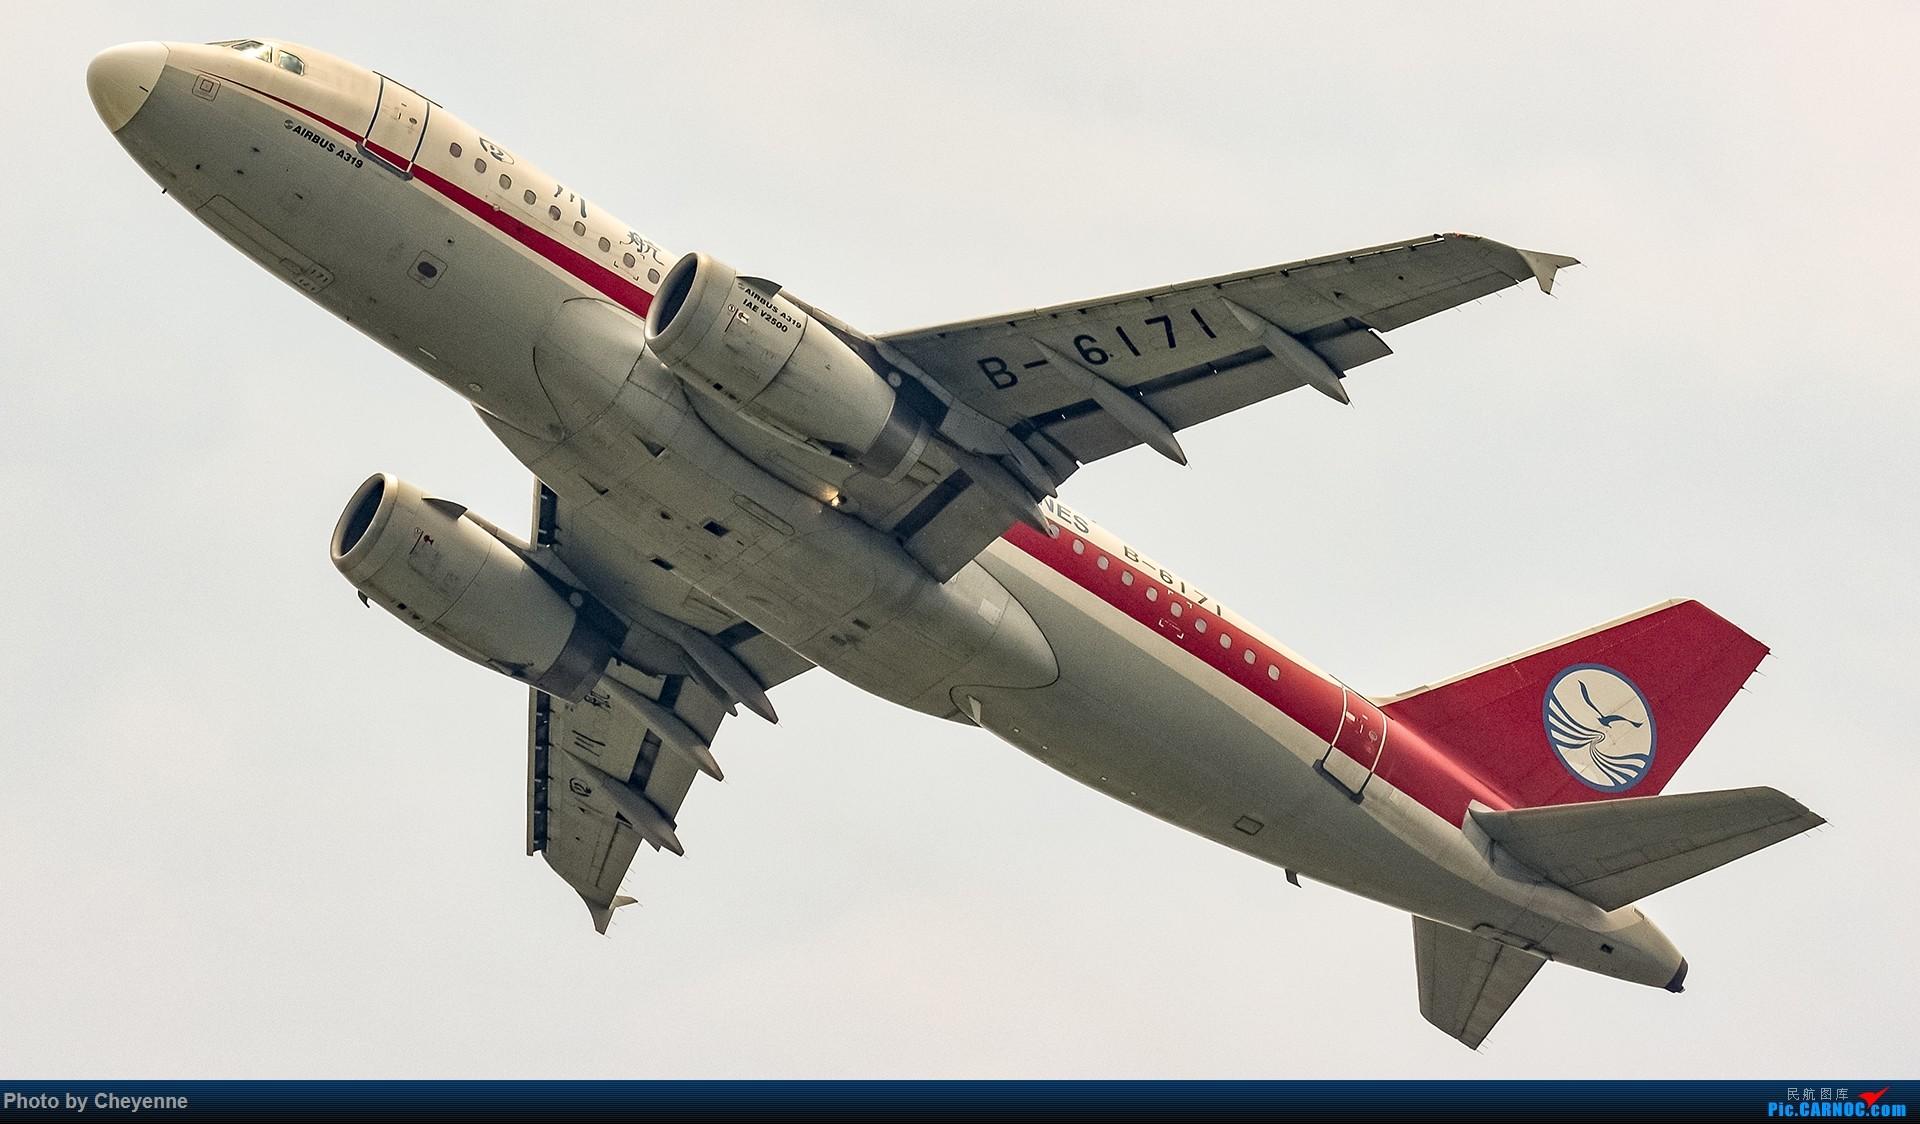 Re:[原创]蓉卢兹之日常 AIRBUS A319-100 B-6171 中国成都双流国际机场